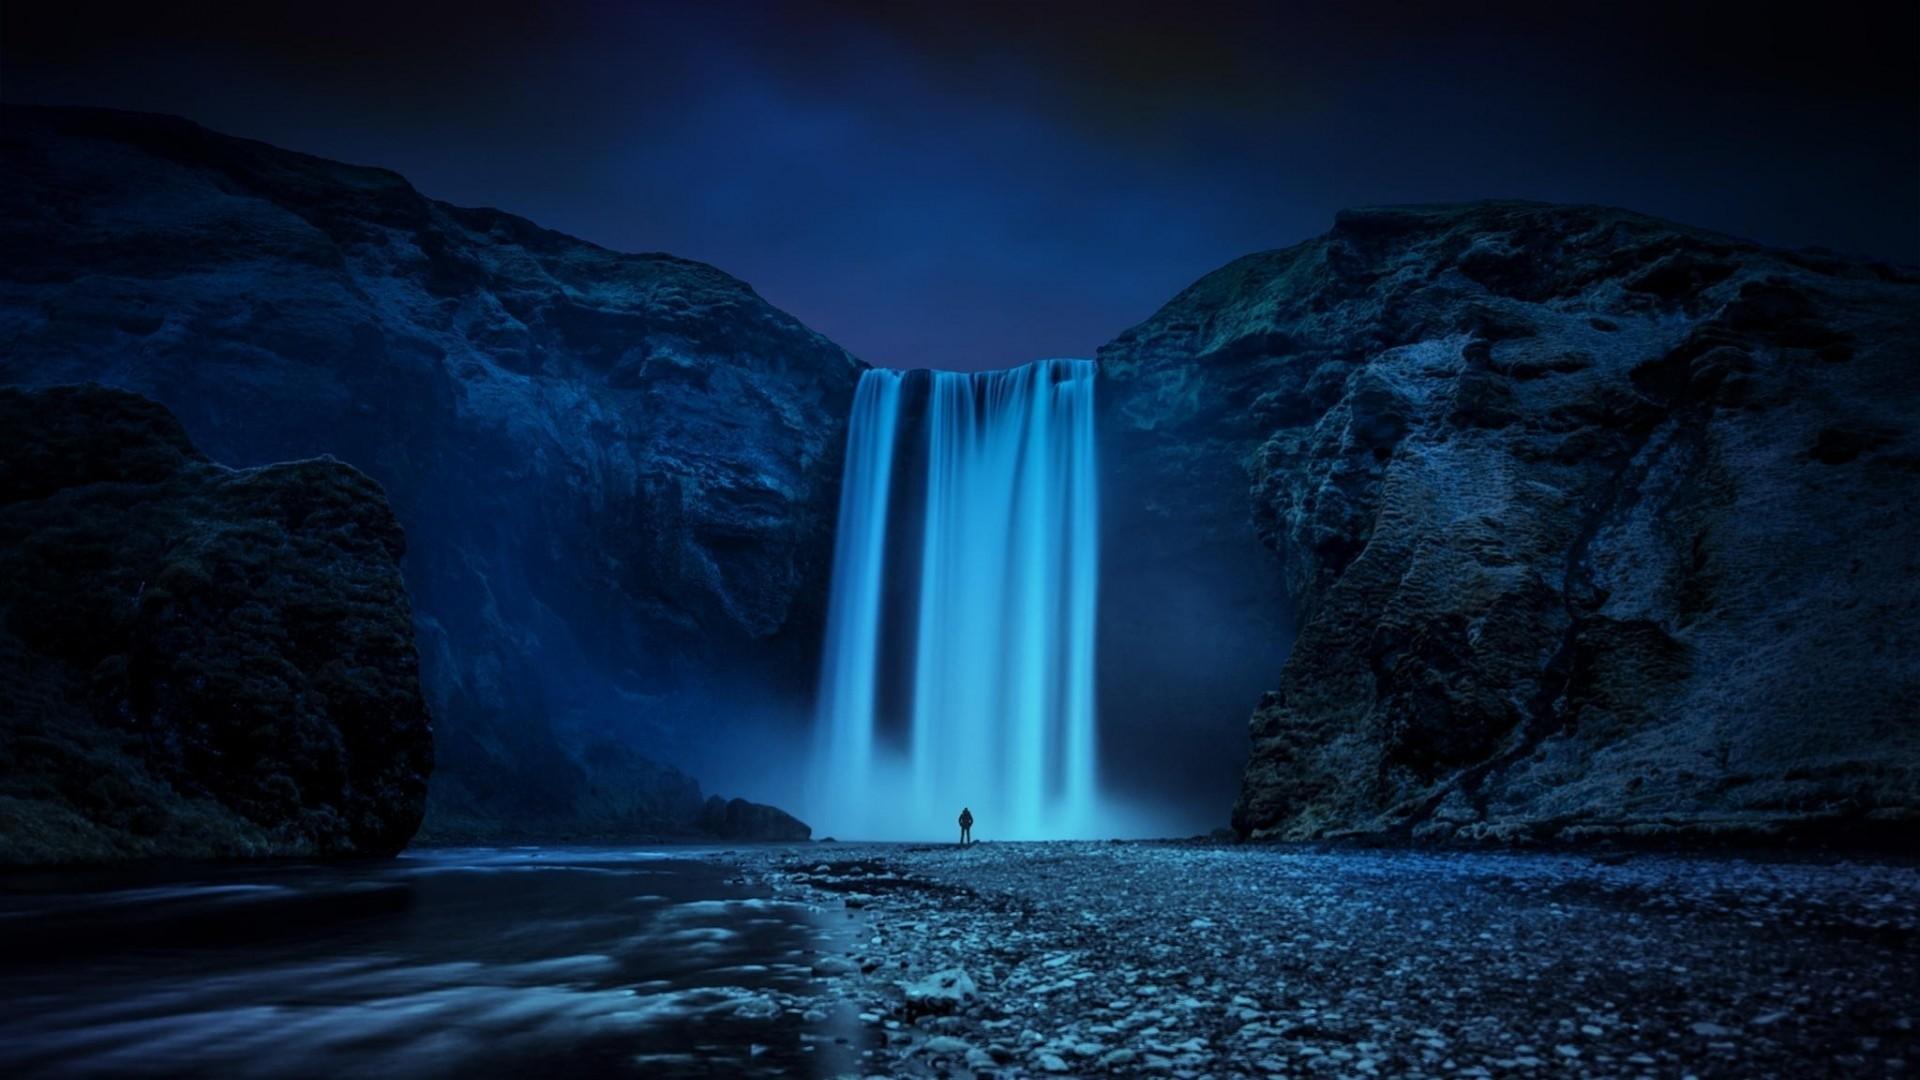 Mountain Nature Night Beautiful Beauty Waterfall Lake 1920x1080 Download Hd Wallpaper Wallpapertip